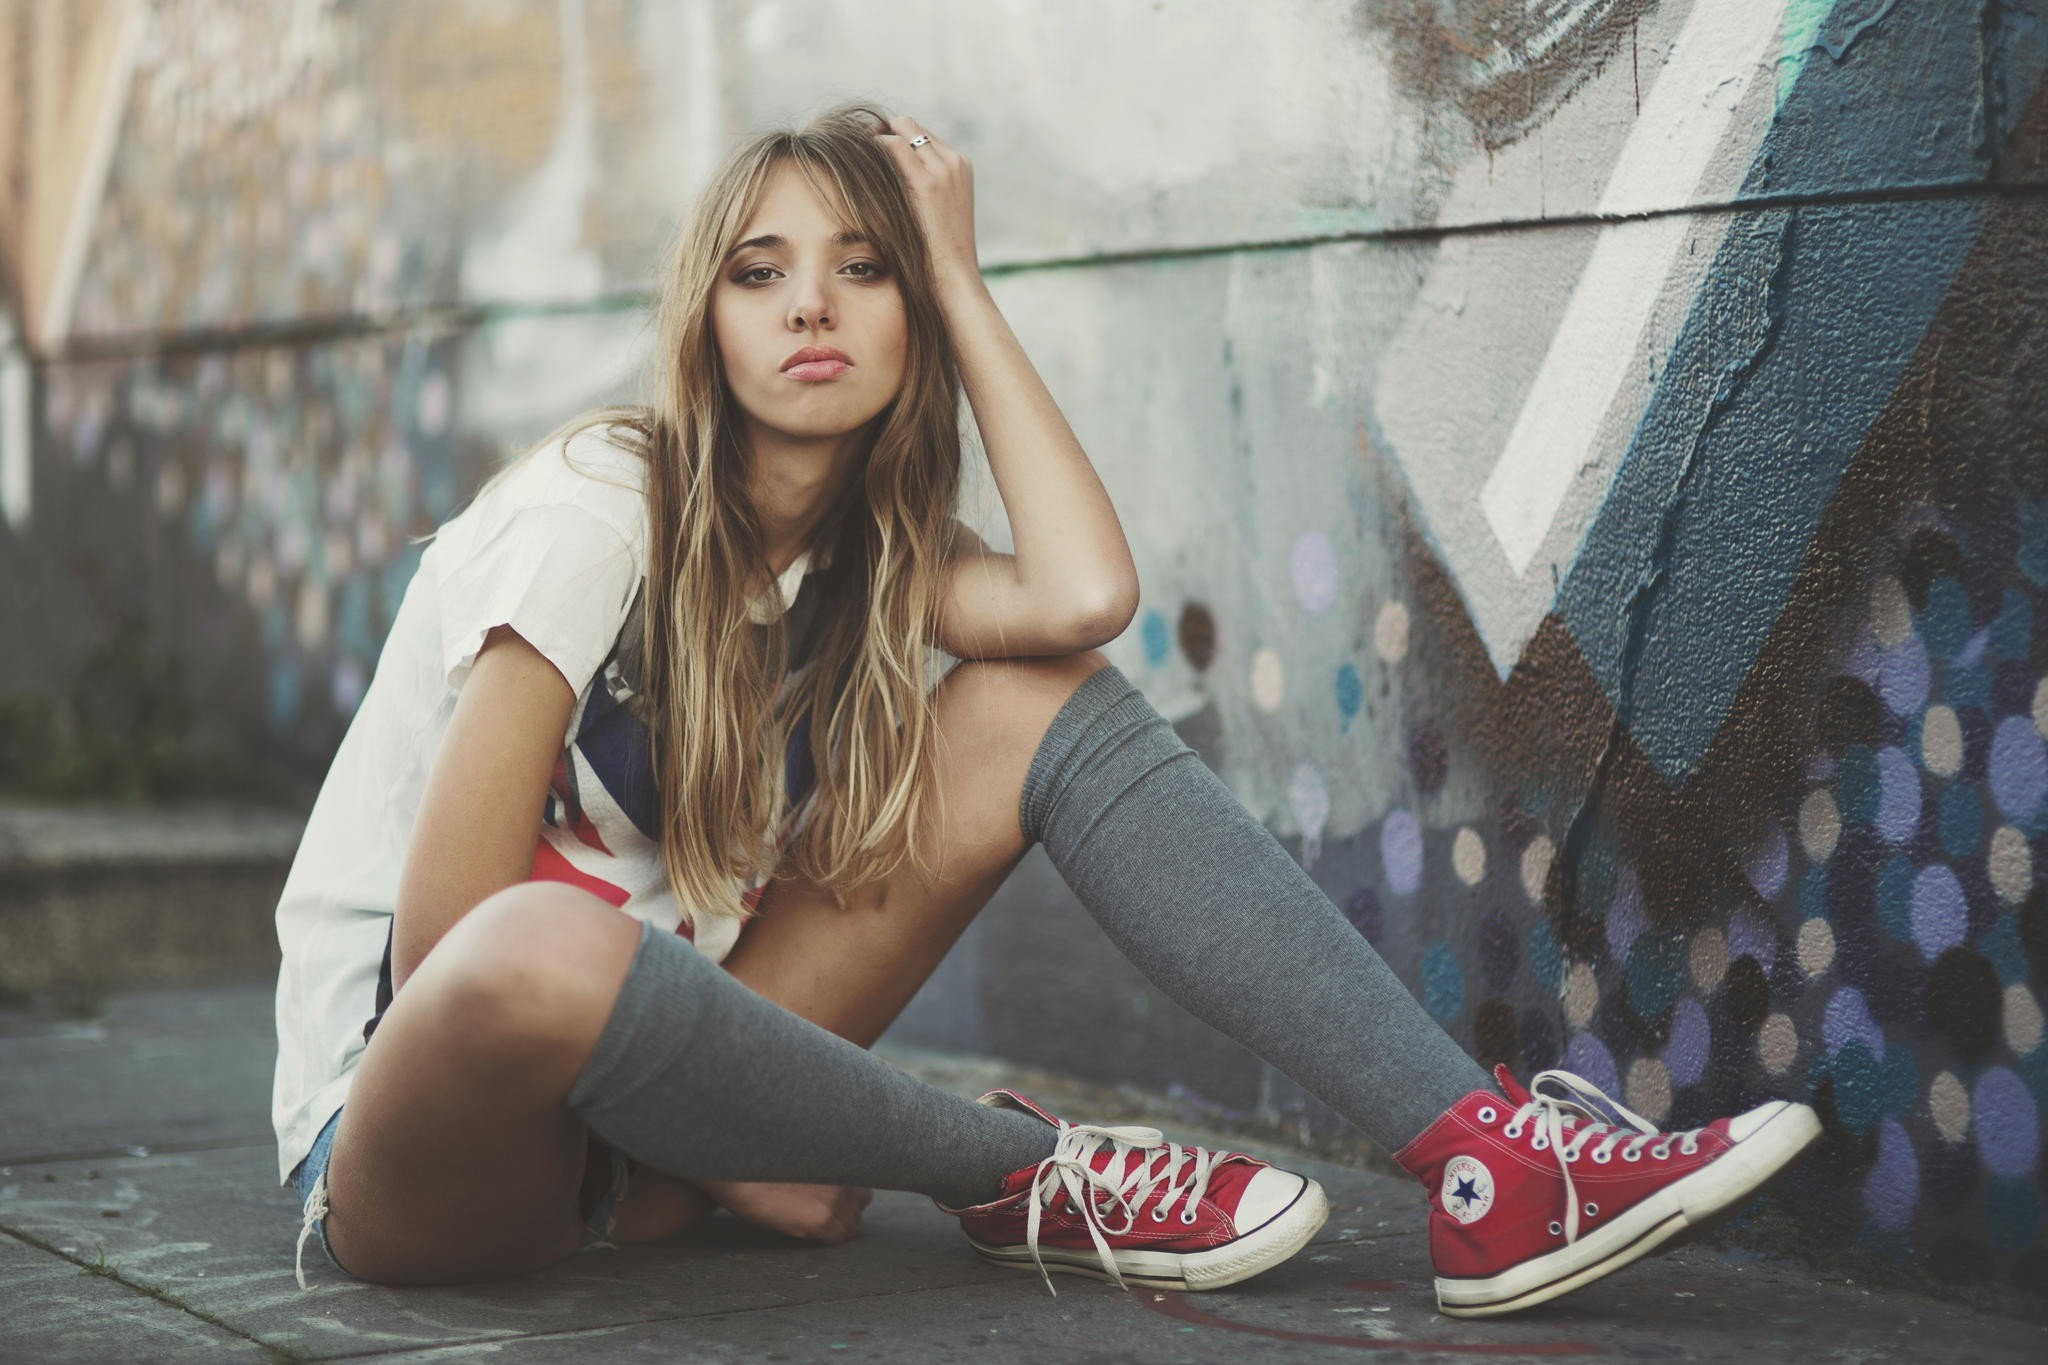 People 2048x1365 women model wall socks gray socks knee high socks sneakers red shoes bent legs on the ground sitting Converse